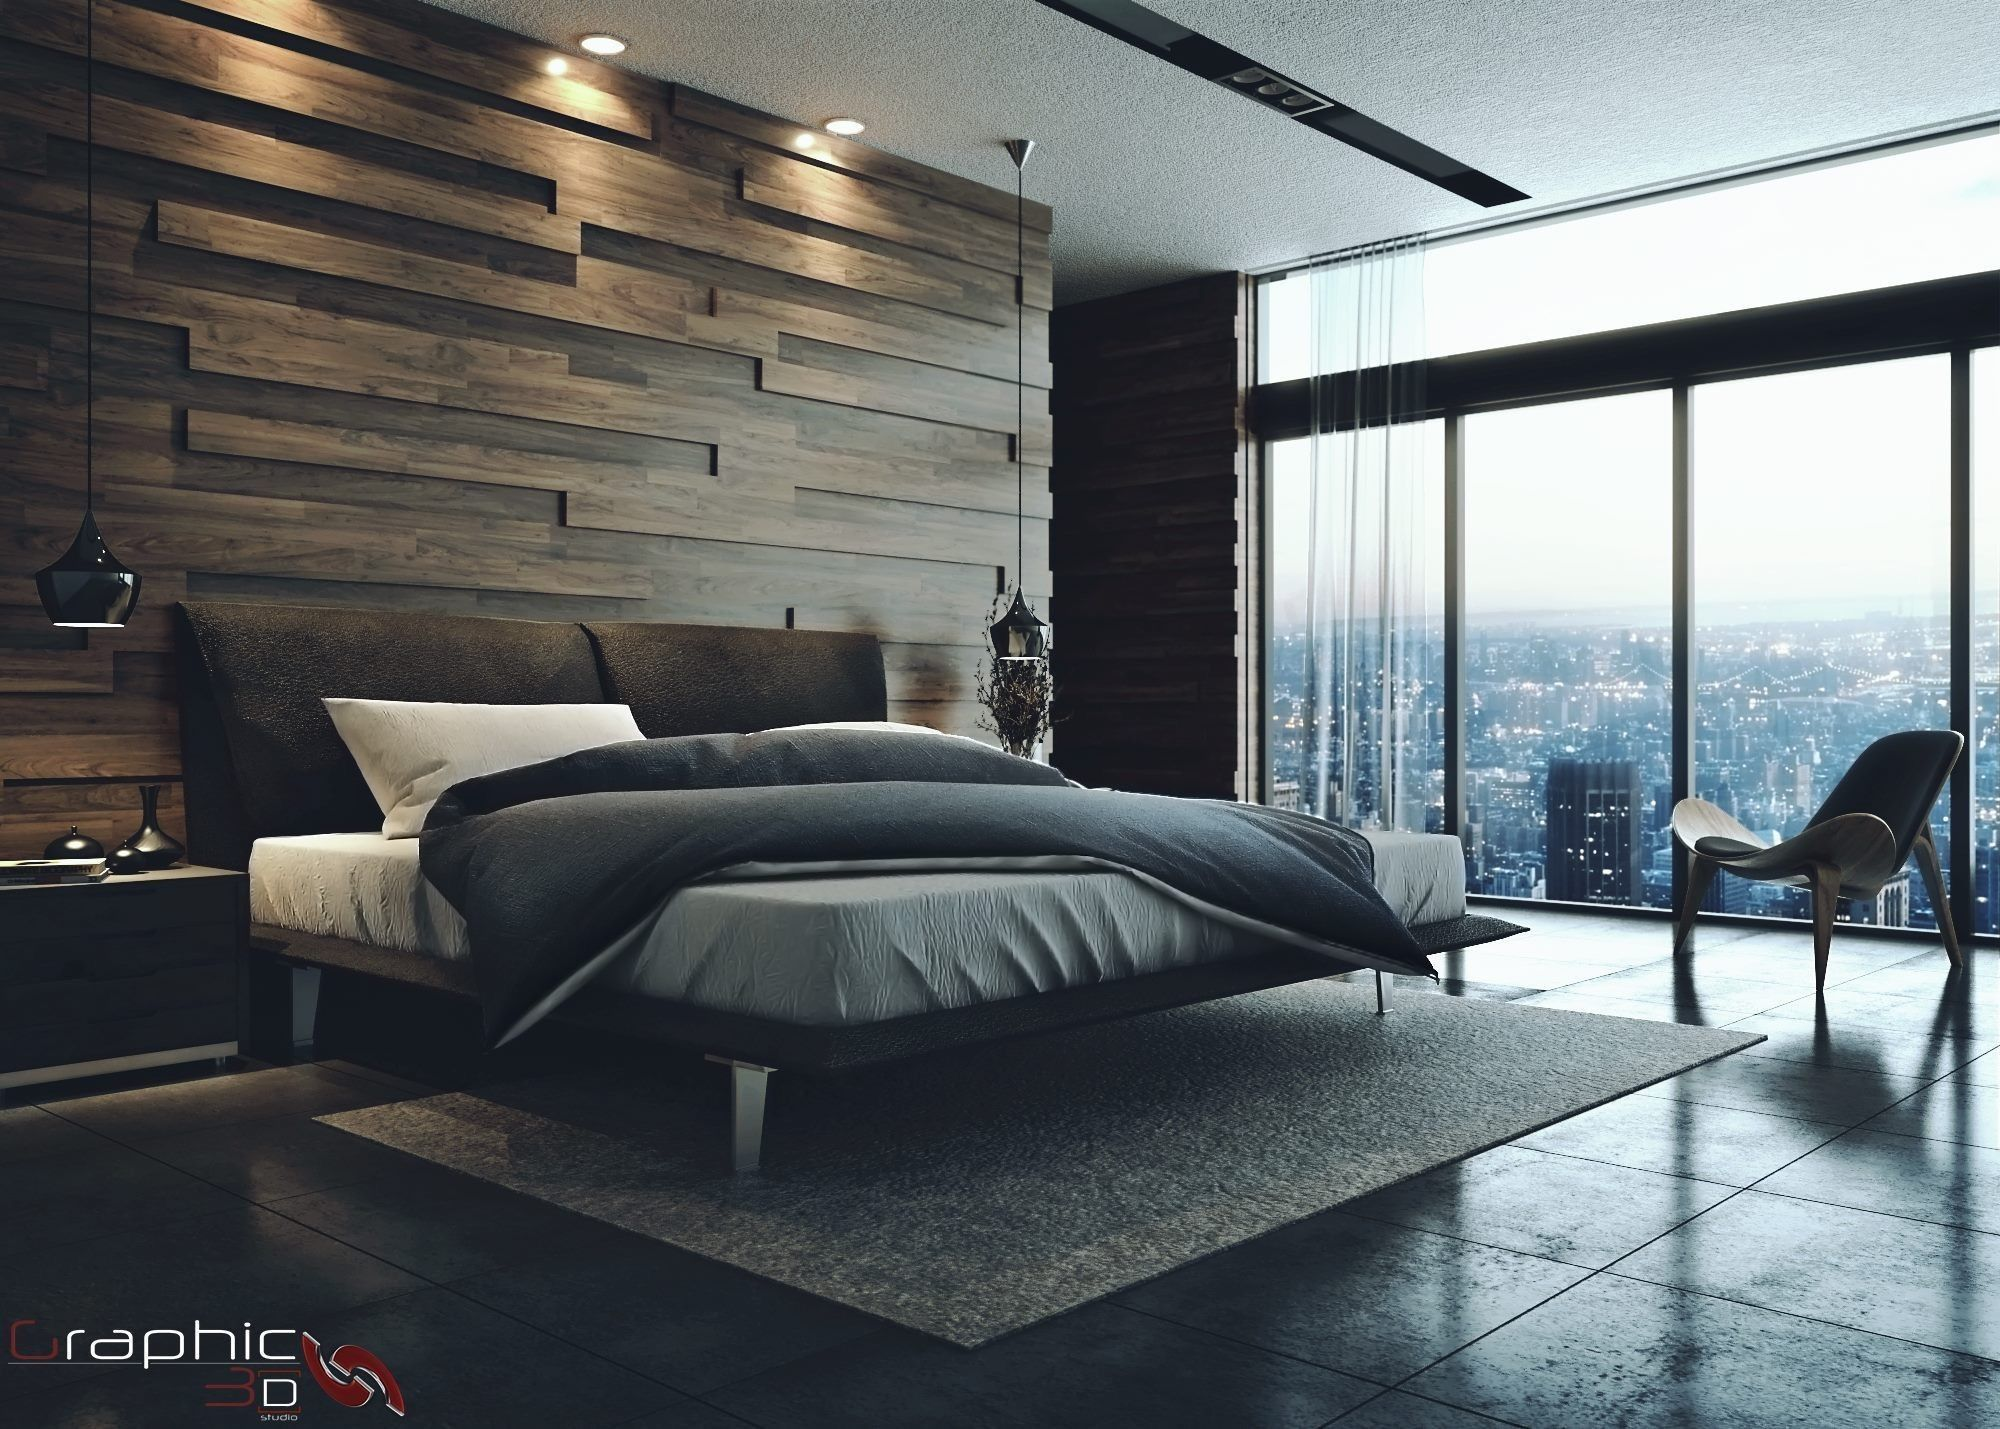 Pin By Yan Shuba On Home Decor Pinterest Modern Bedroom Home Bedroom Luxury Bedroom Master